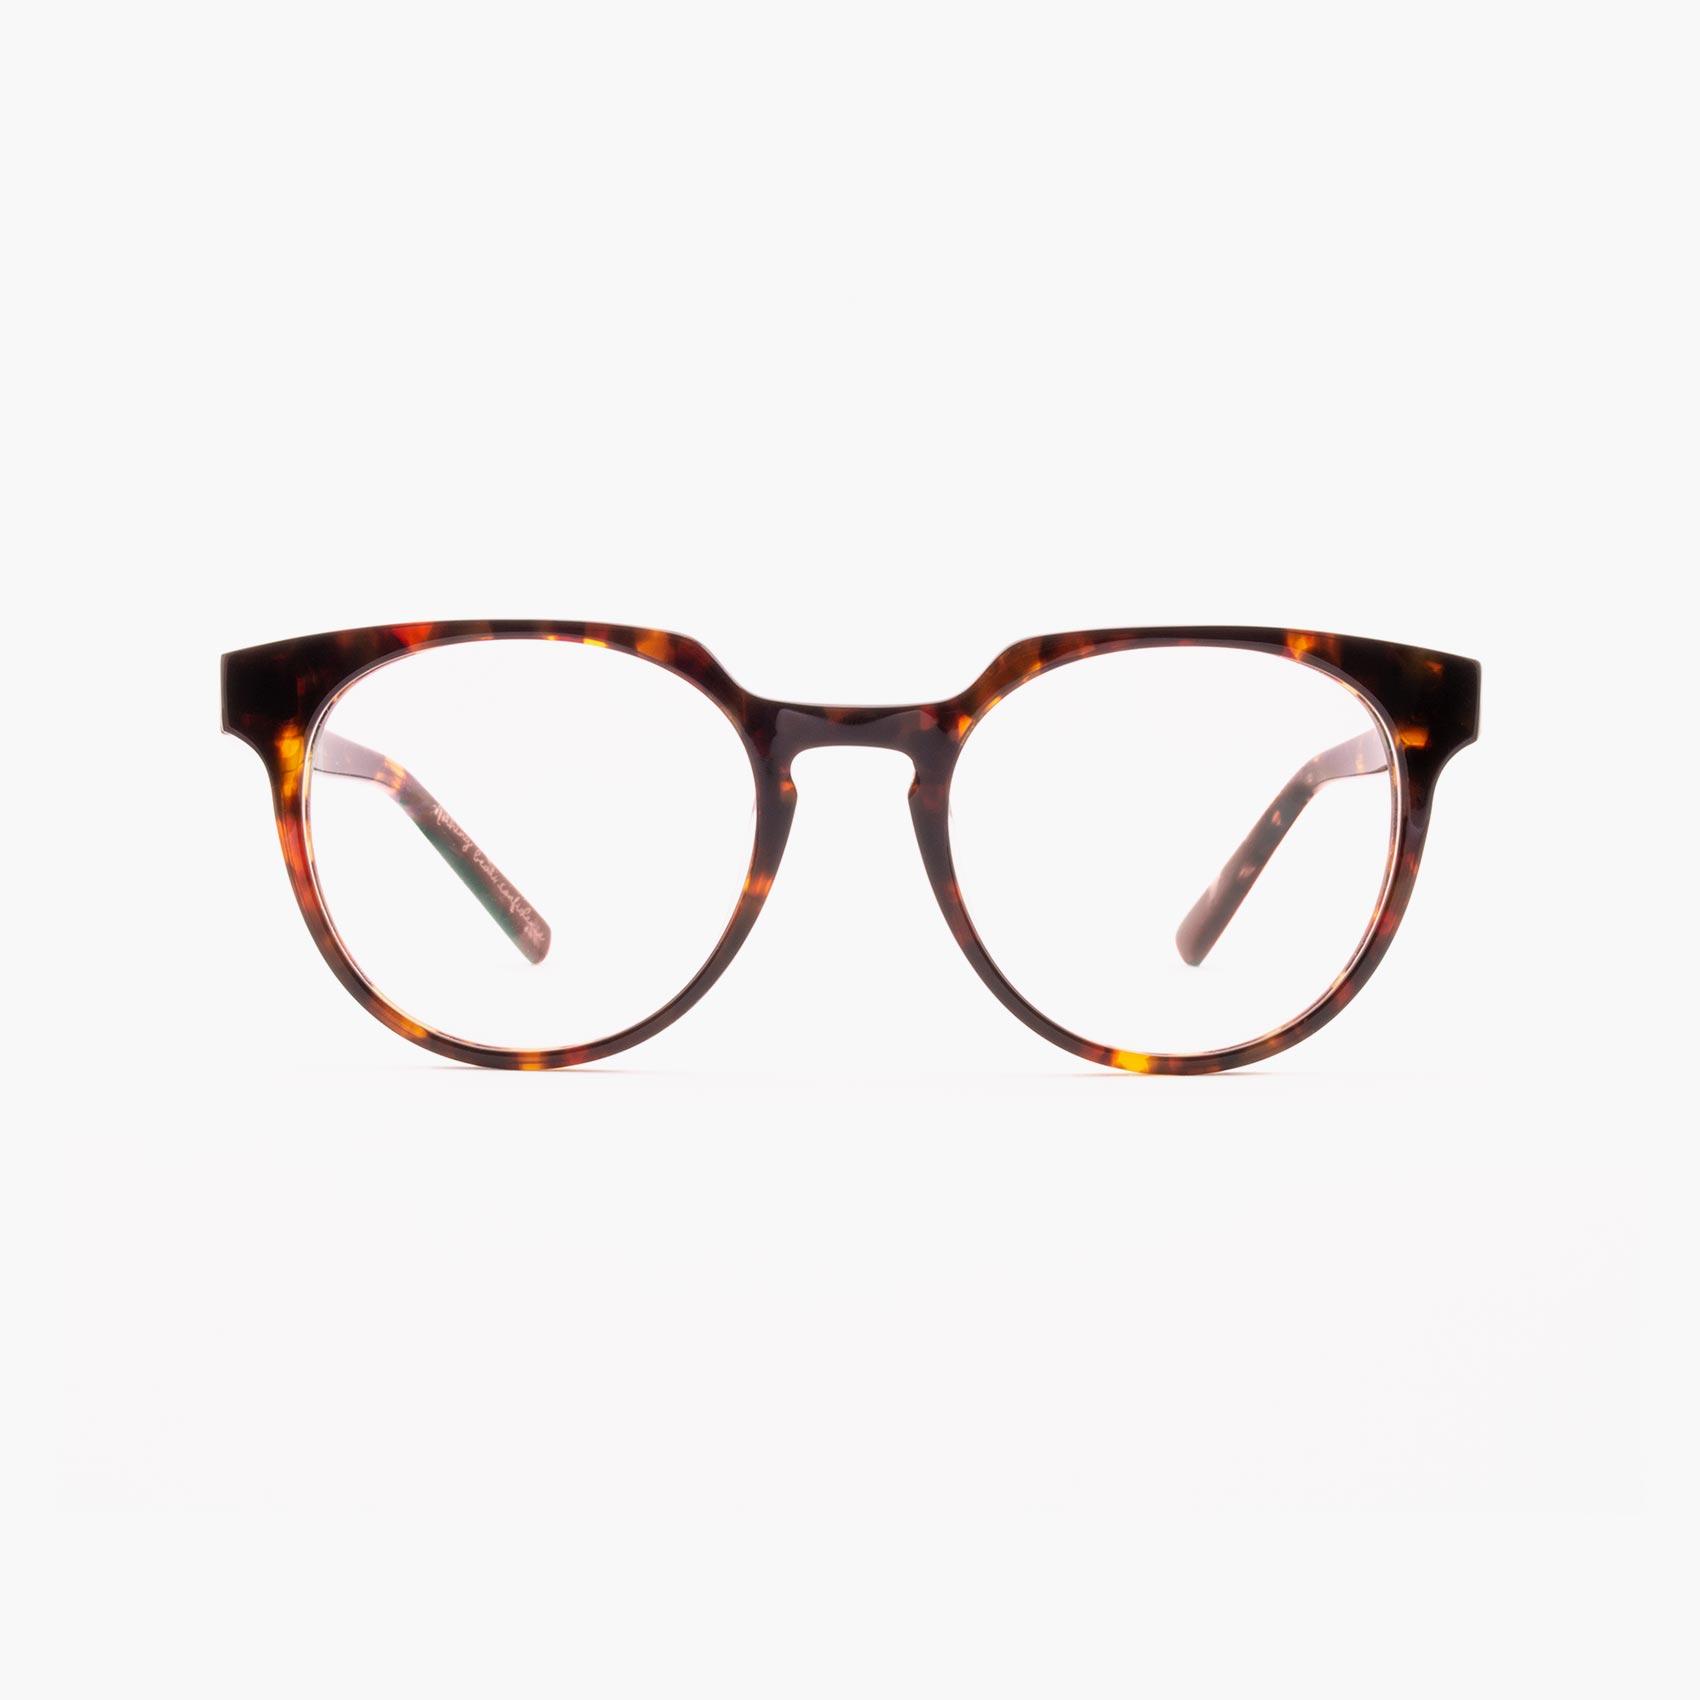 Proud eyewear Benigni C1 F gafas puente cerradura havana